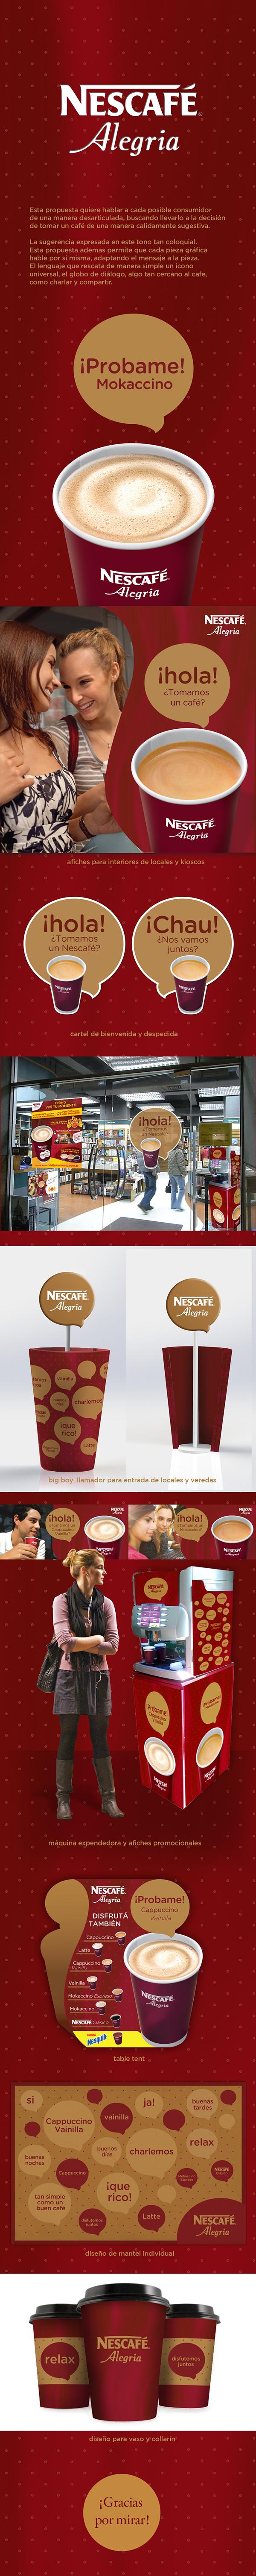 cafe Coffee nescafe alegria pop Point of Purchase diseño